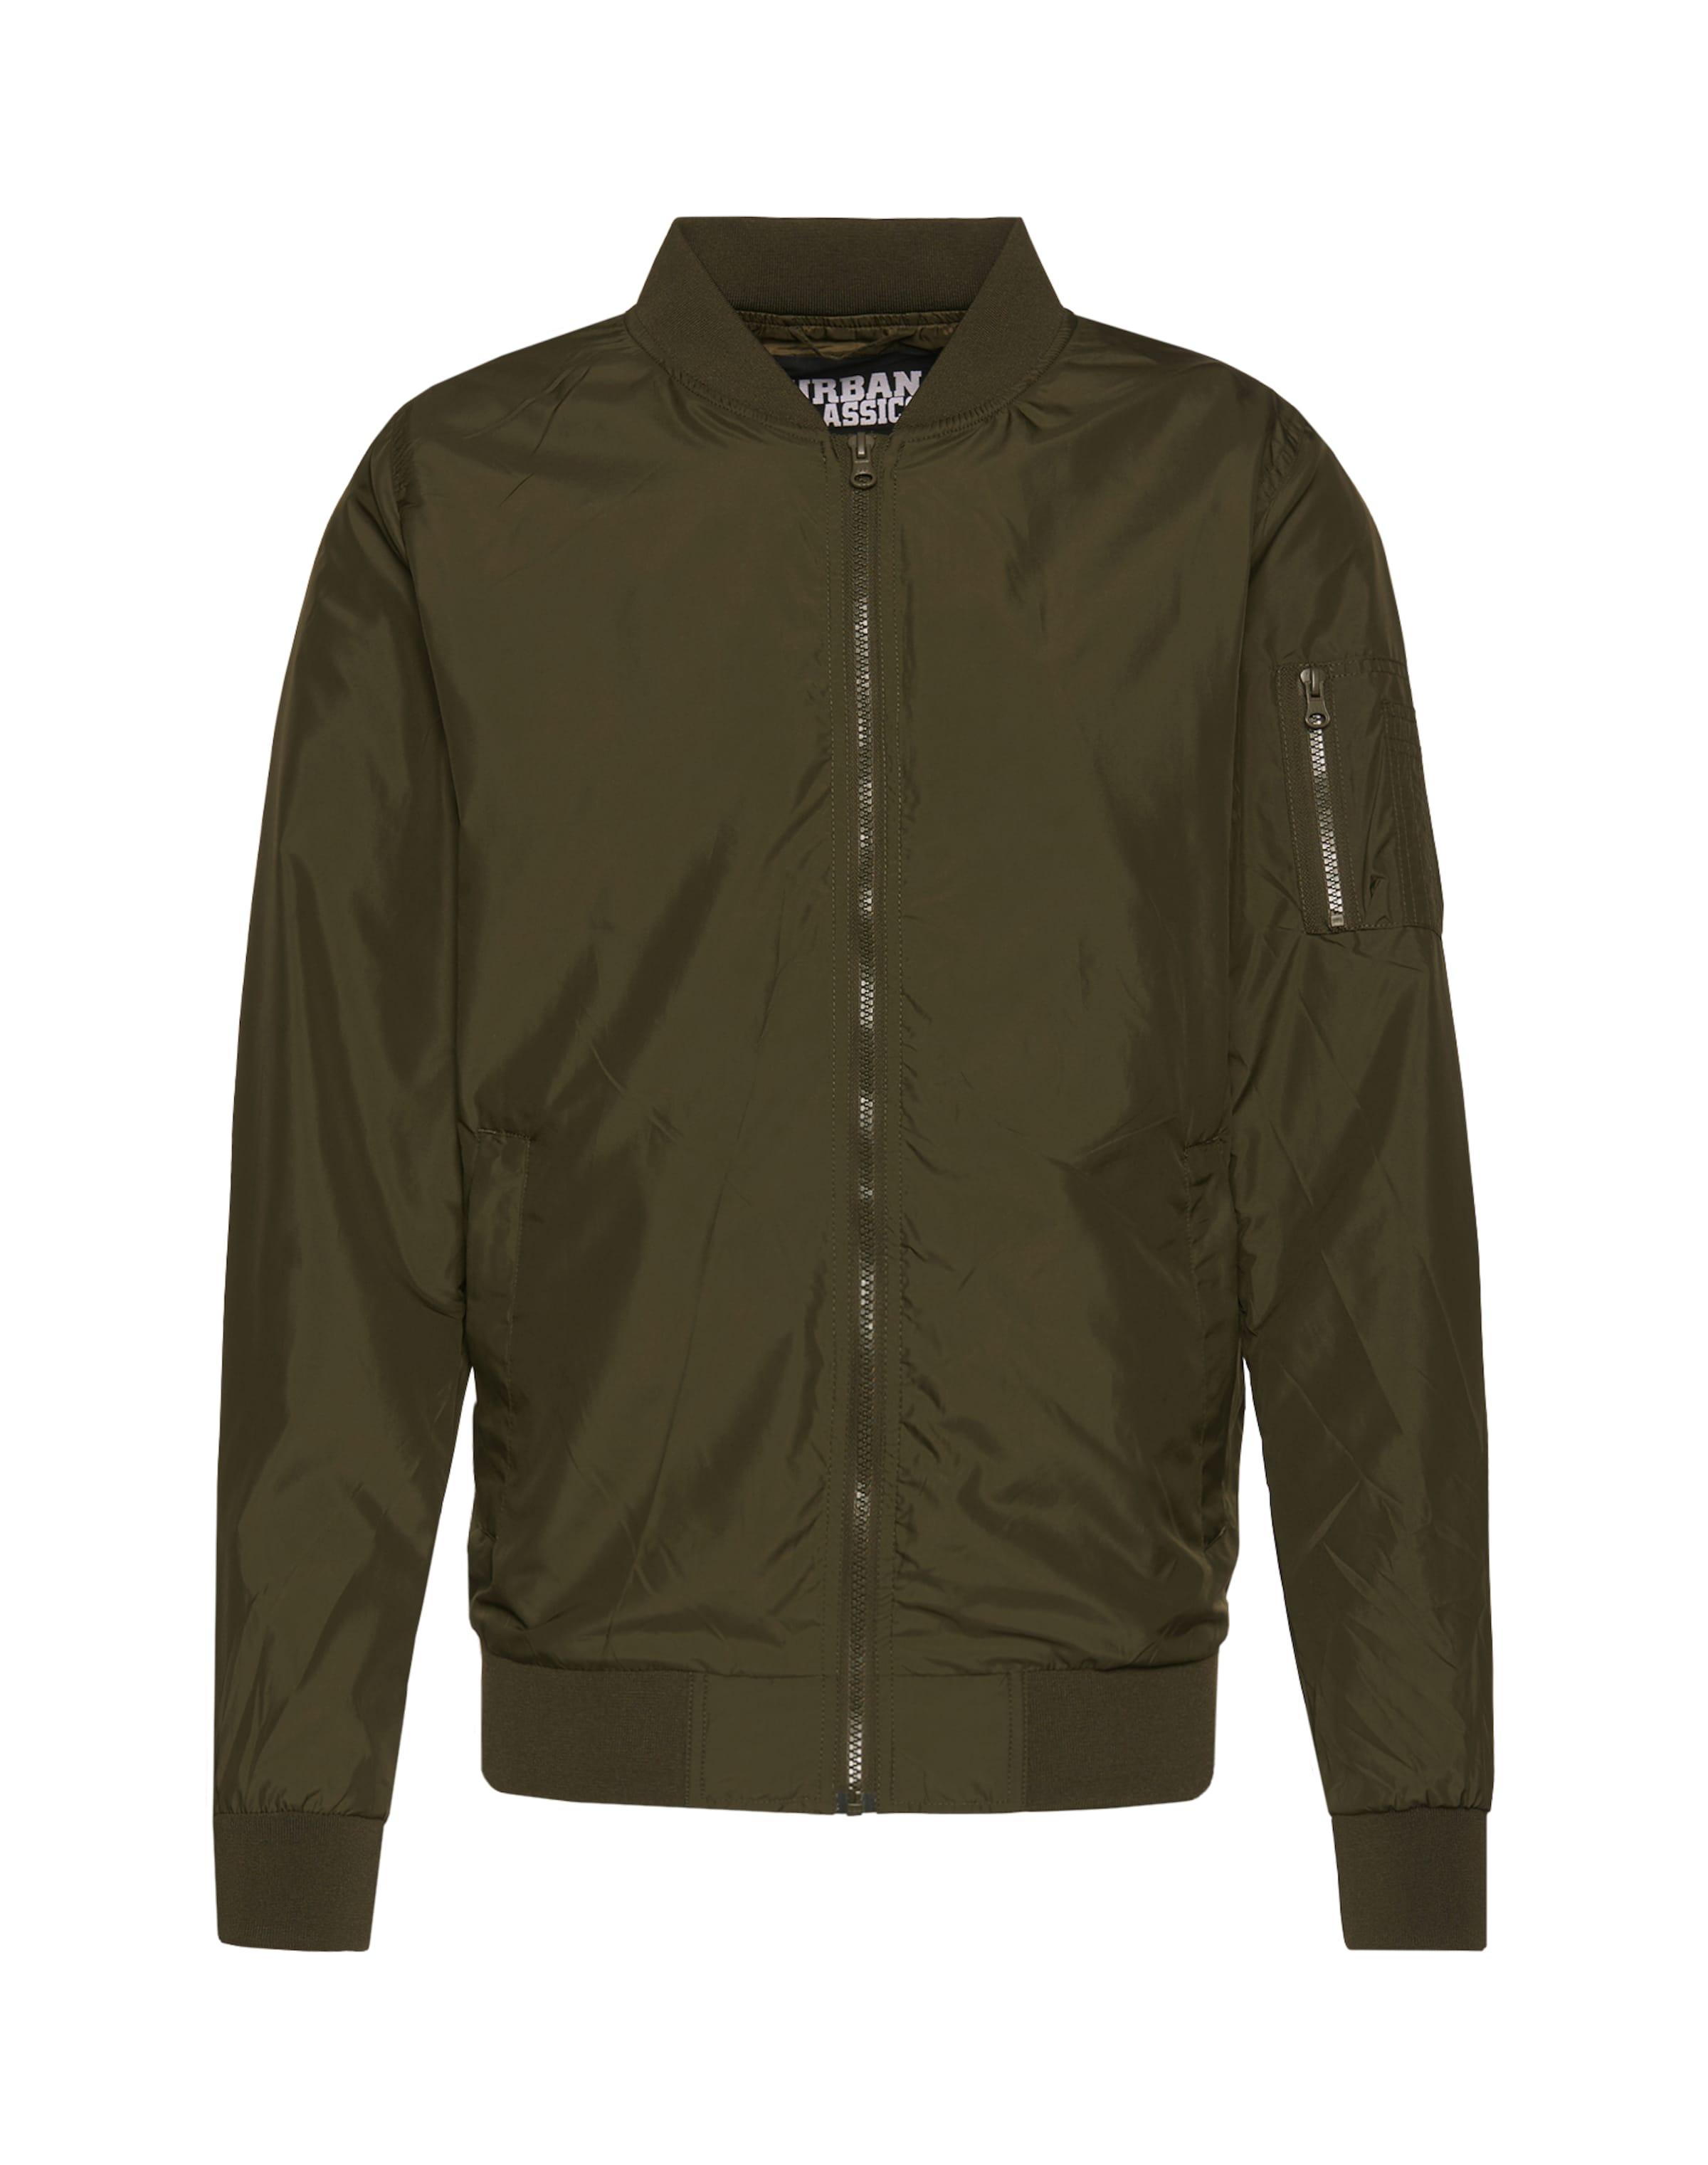 Urban Classics 'light Olive Veste saison En Bomber Jacket' Mi K3JclF1uT